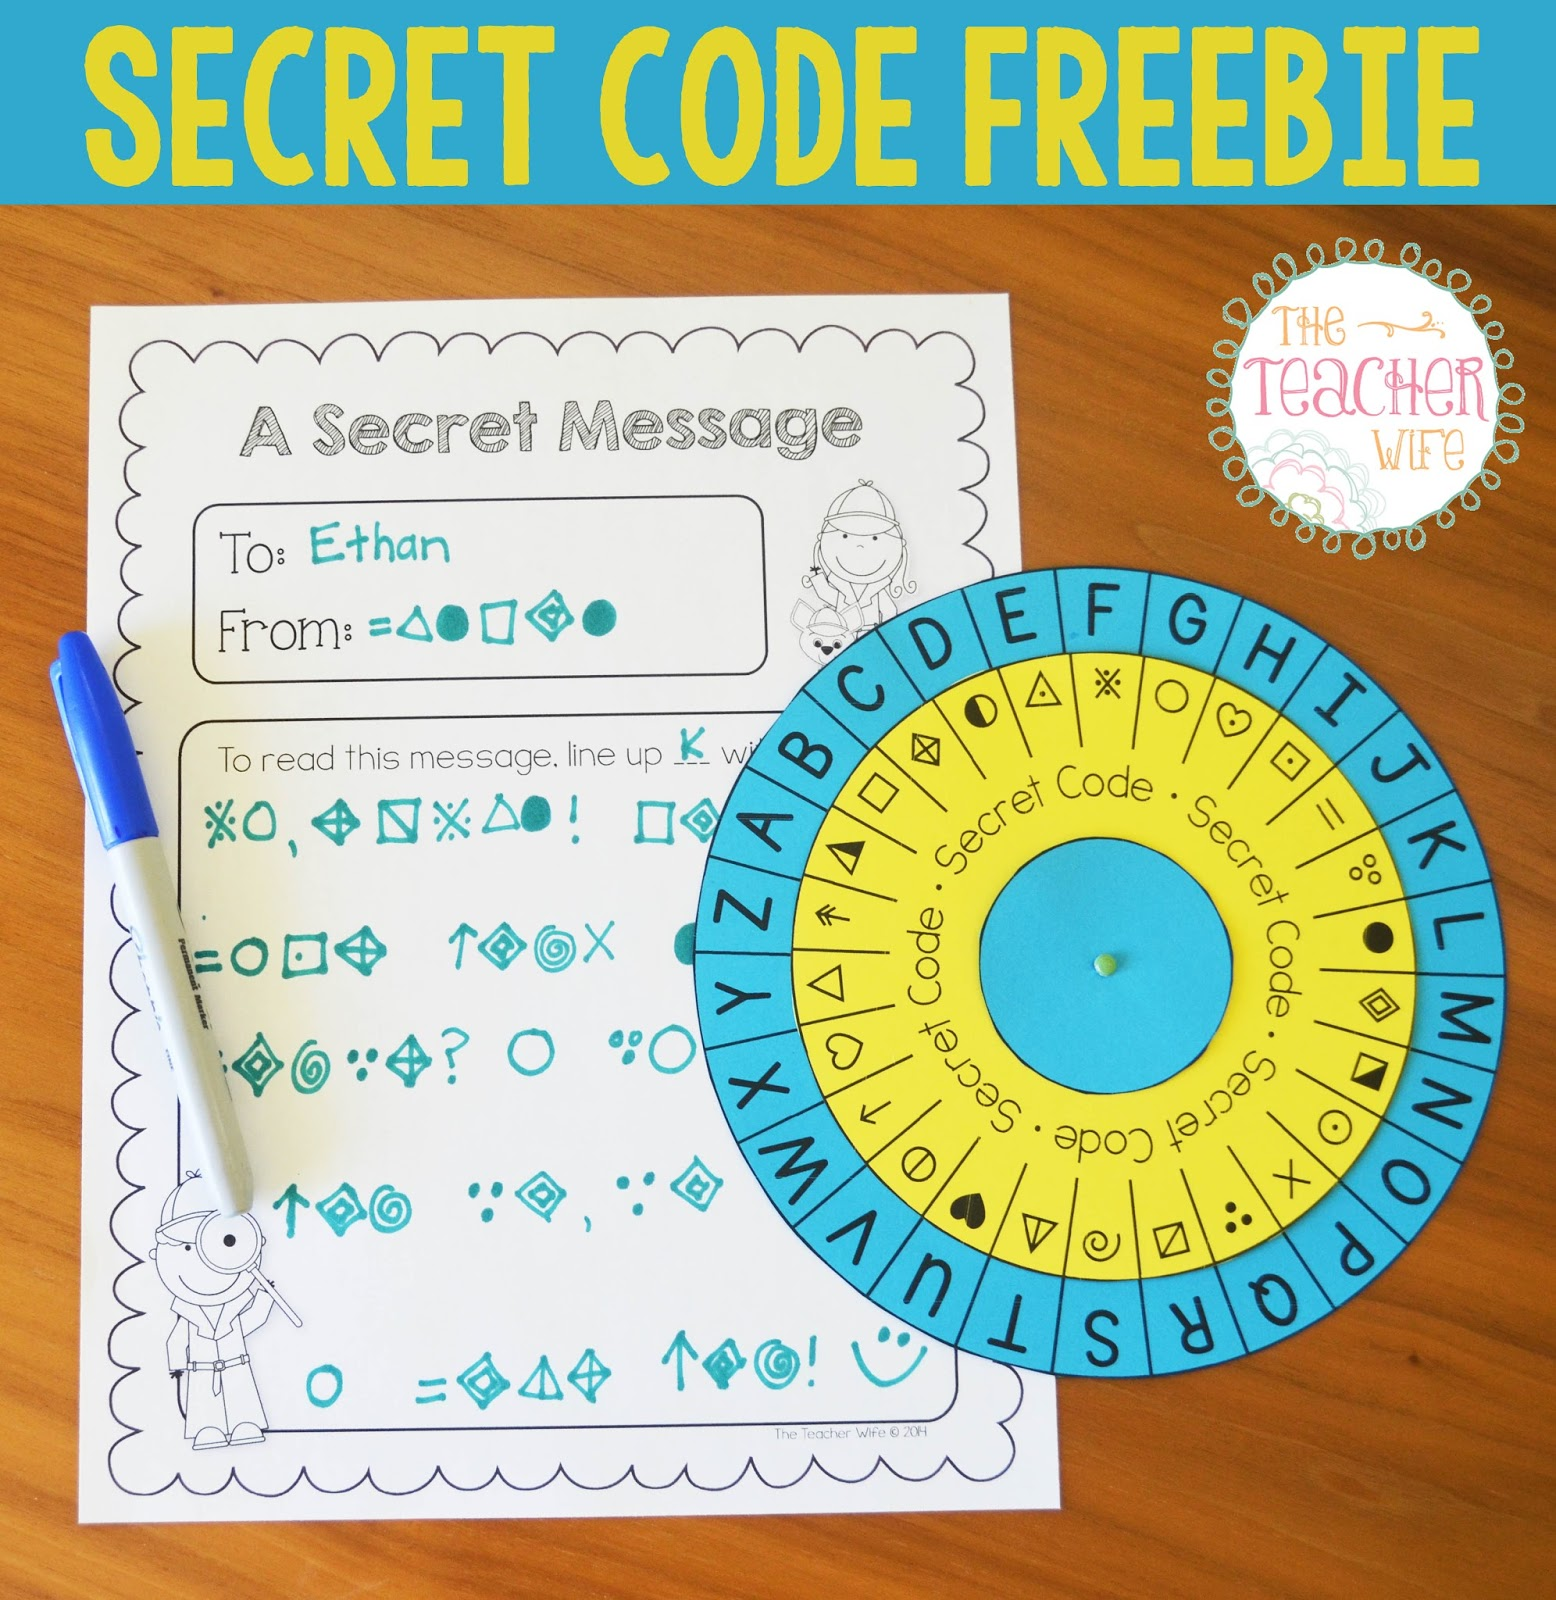 Secret Code Freebie